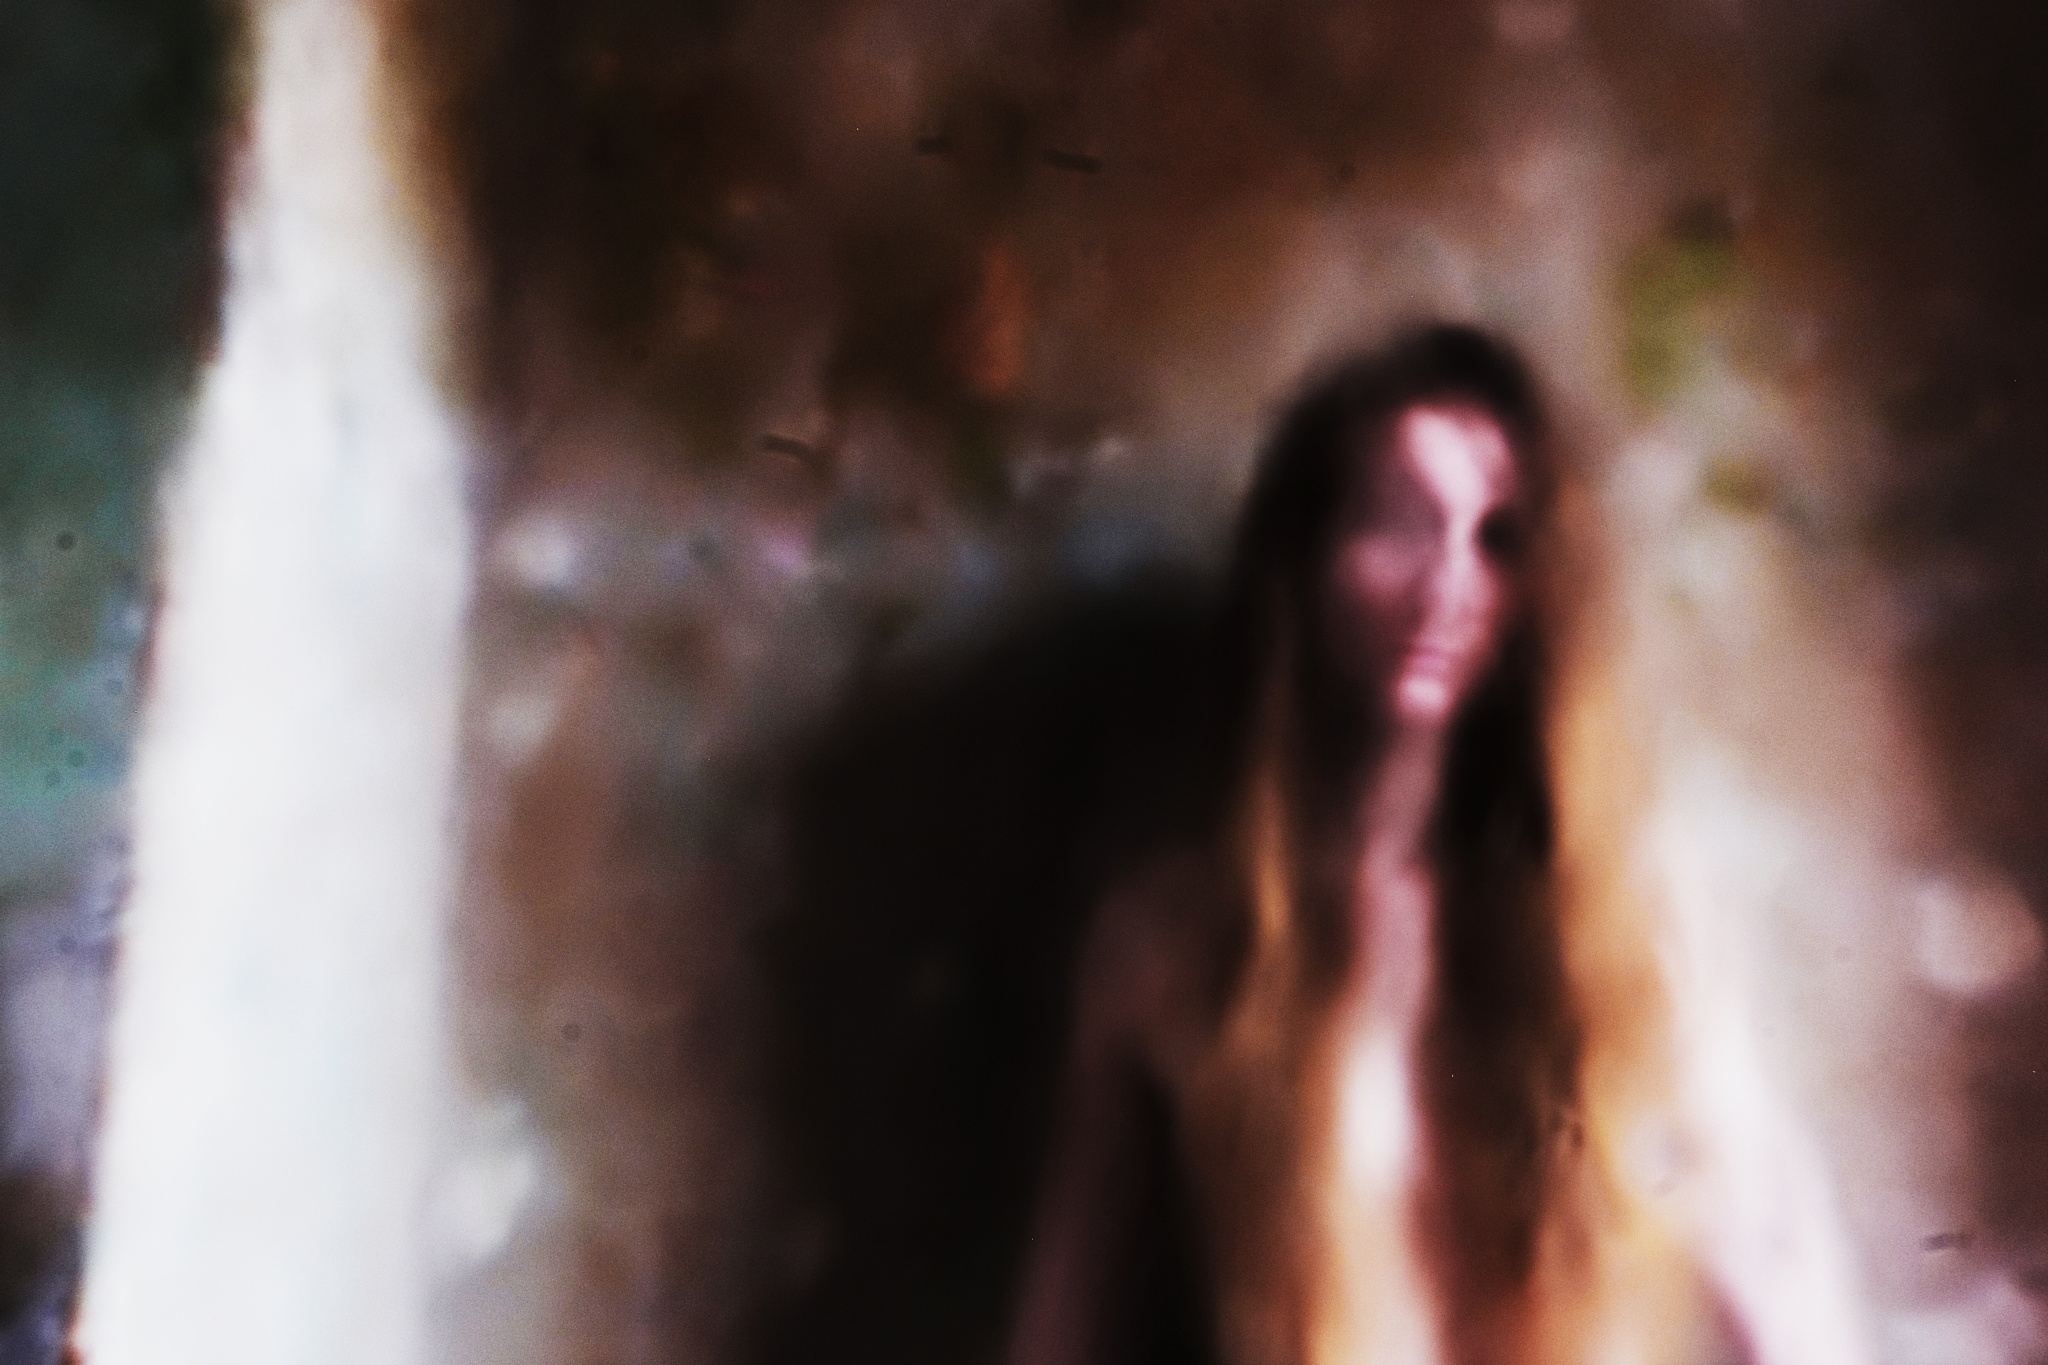 Distorted Portrait Collection by RaymondJordon